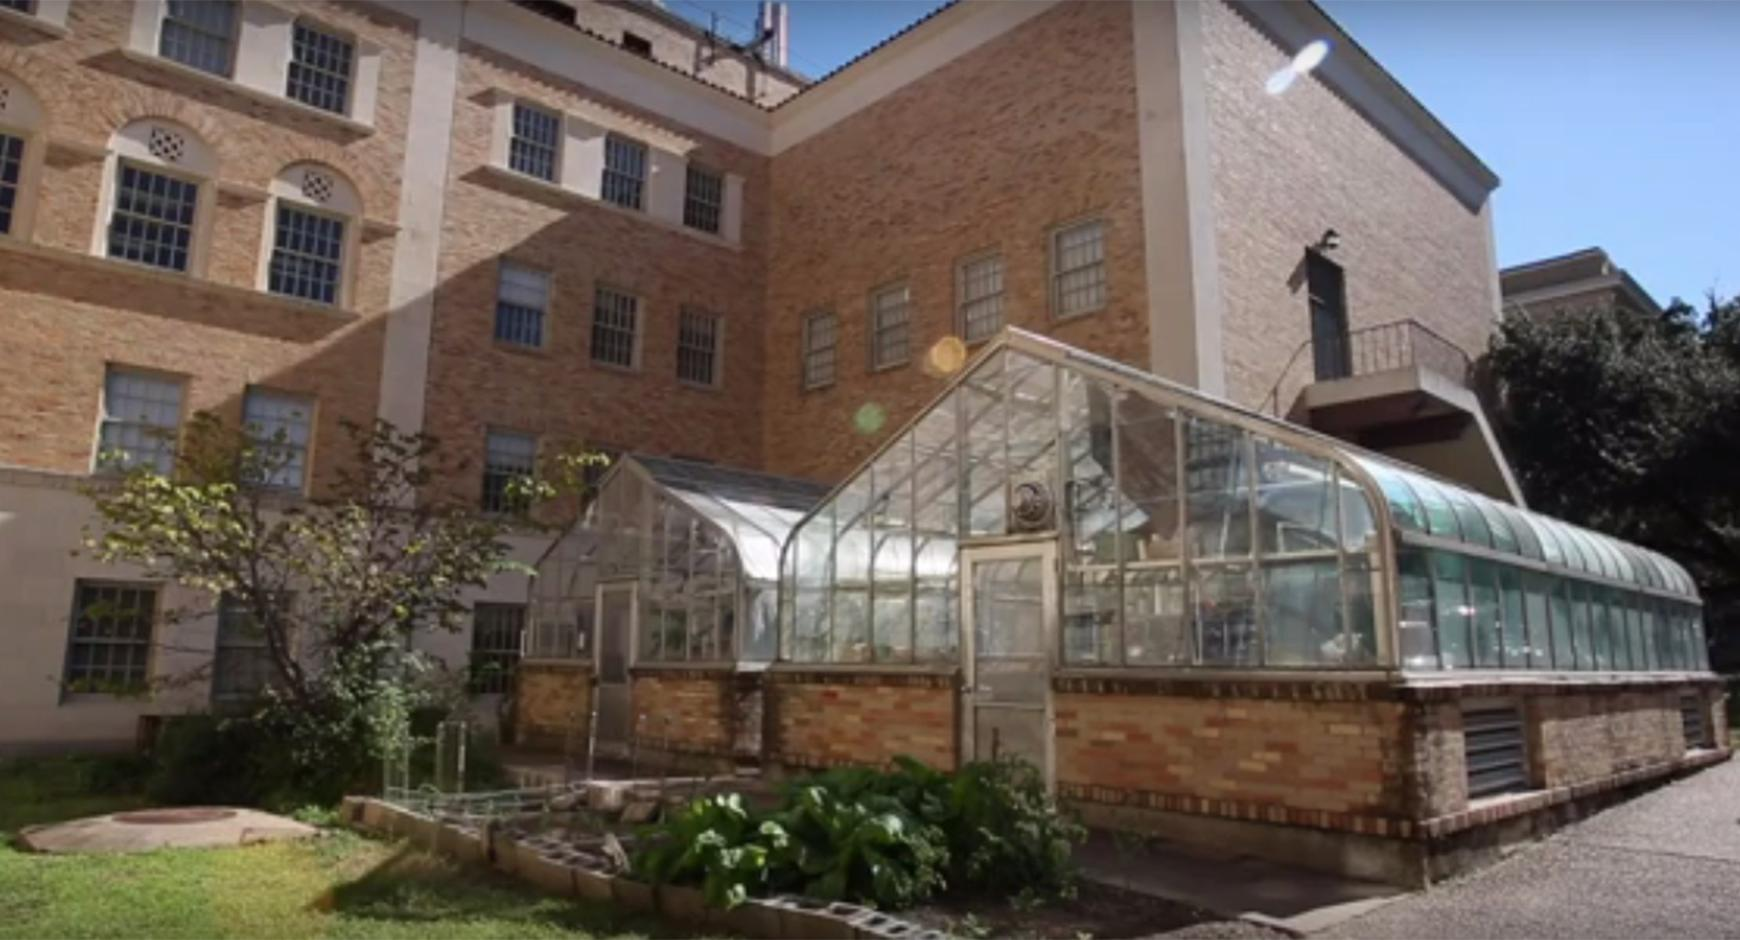 Painter Greenhouse